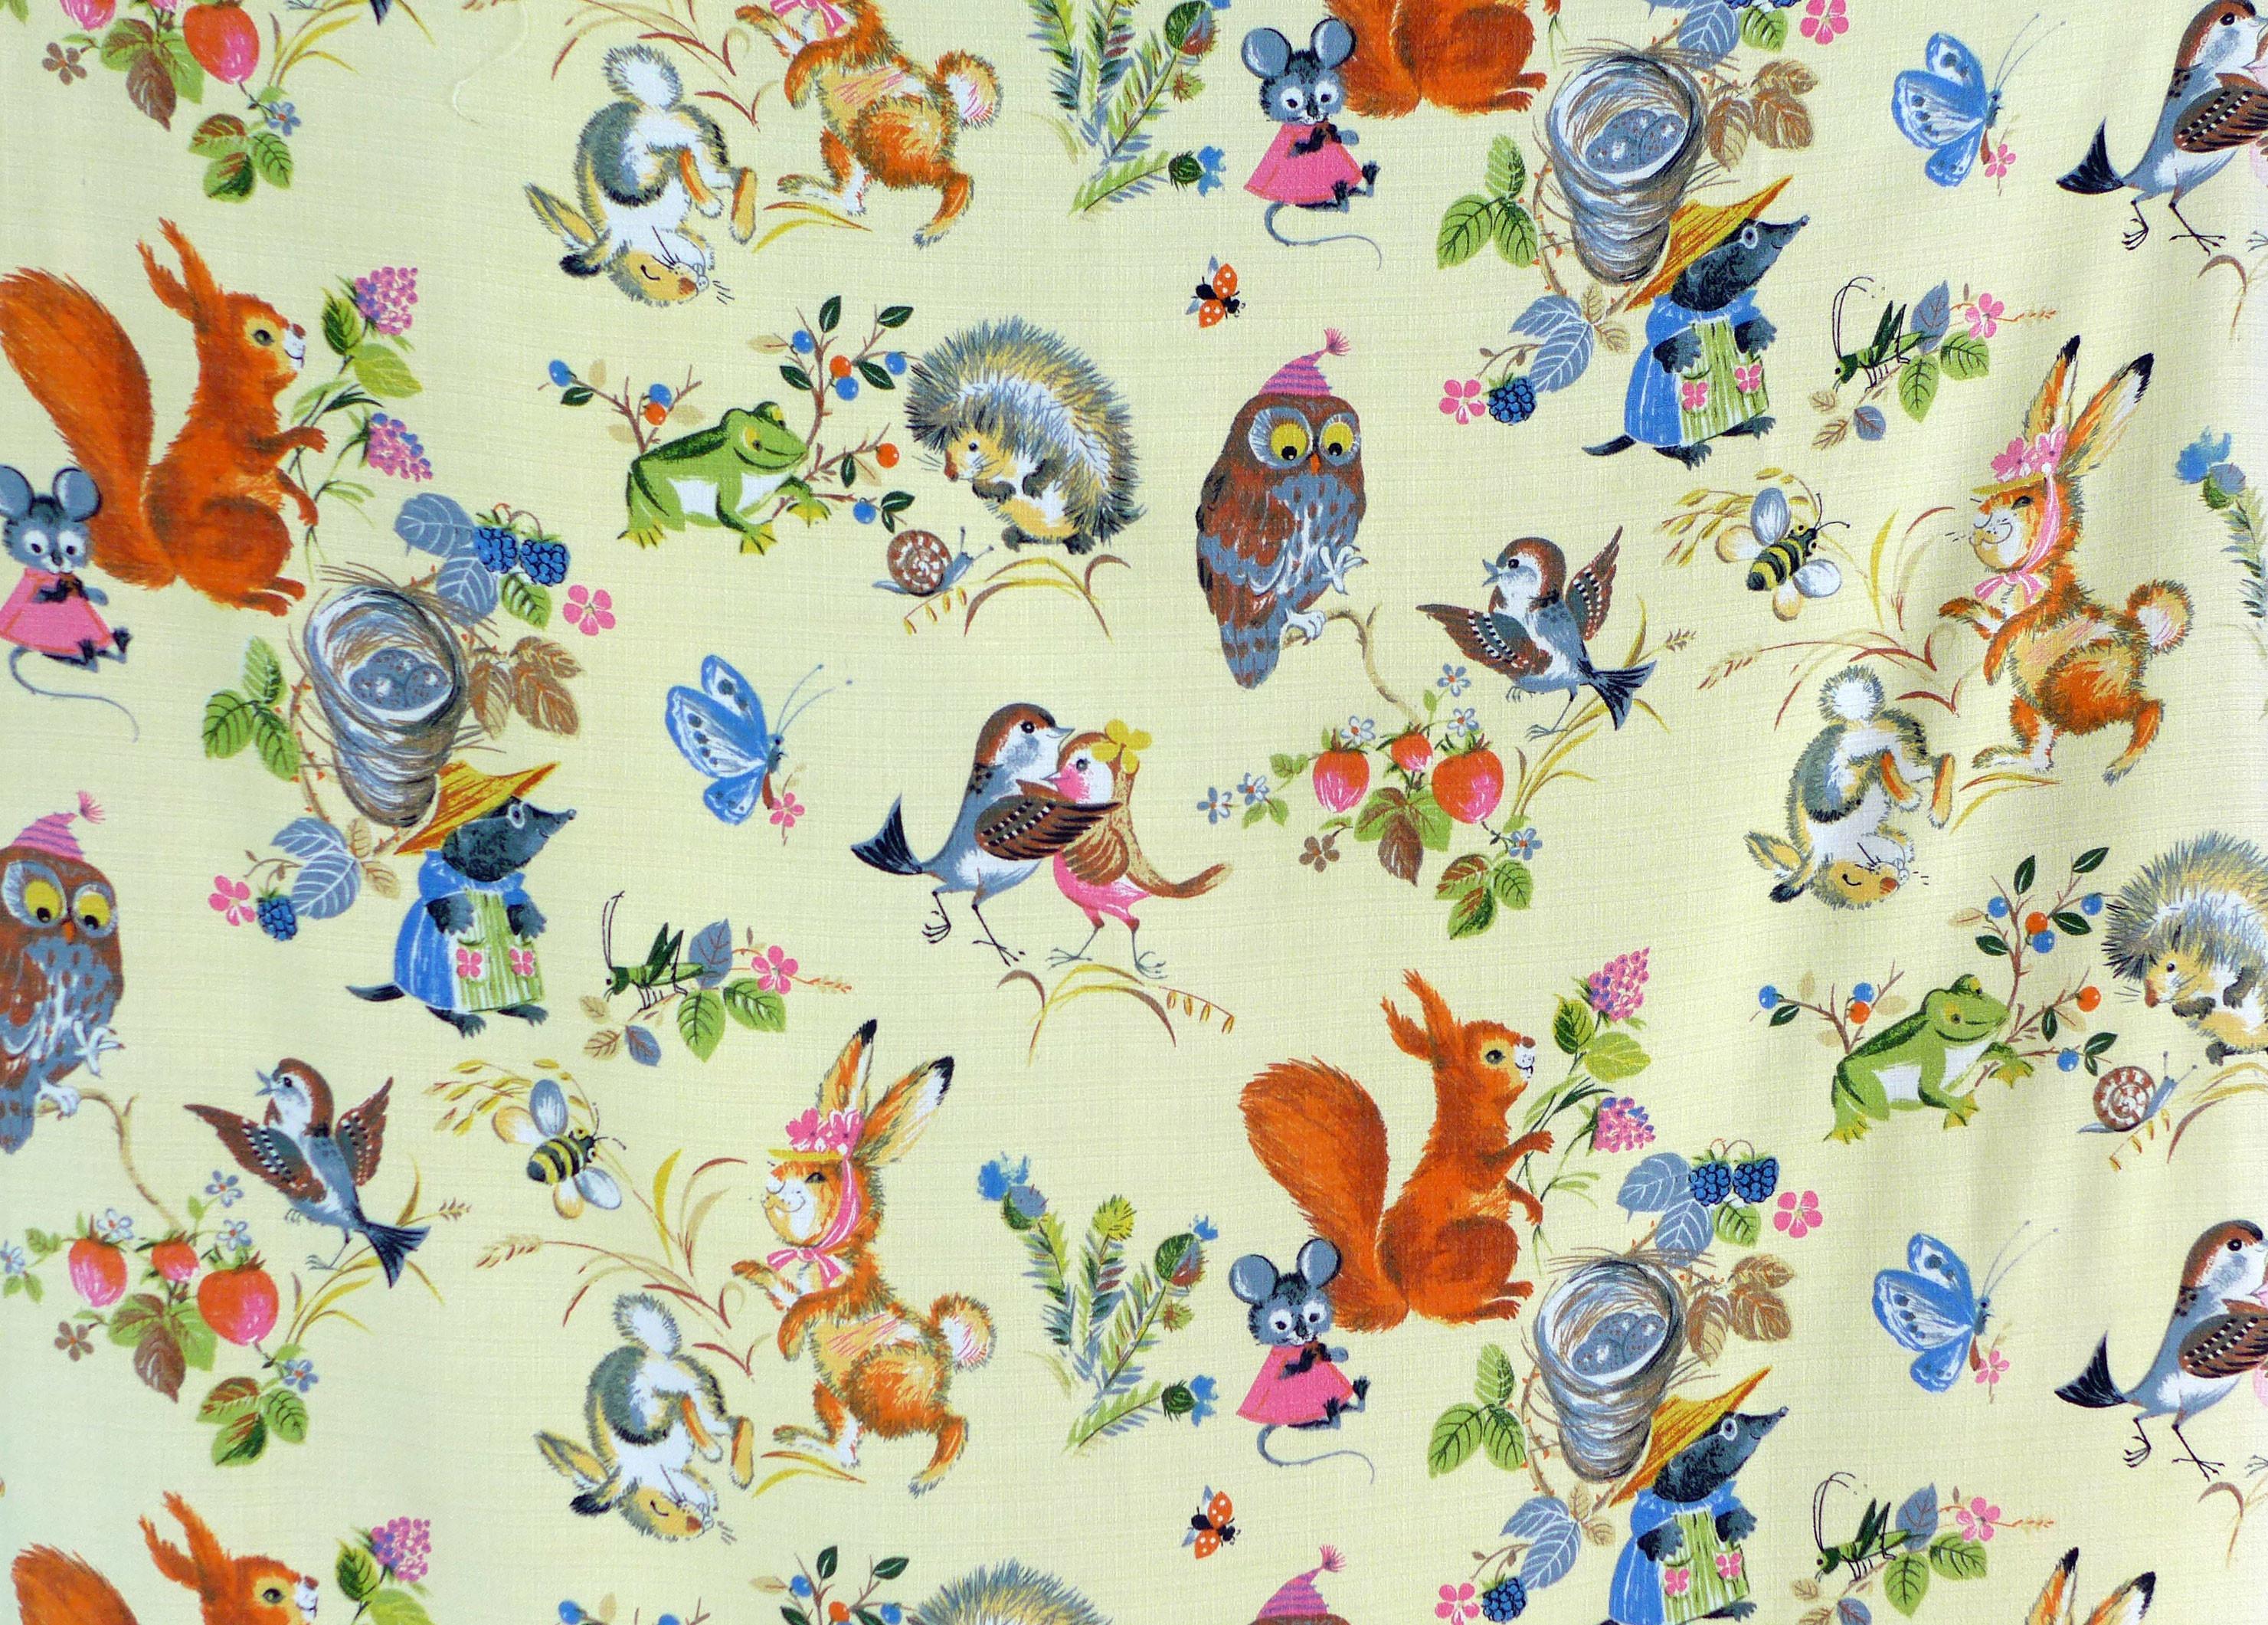 Res: 2961x2121, childrens vintage wallpaper vintage childrens wallpaper uk cool picture